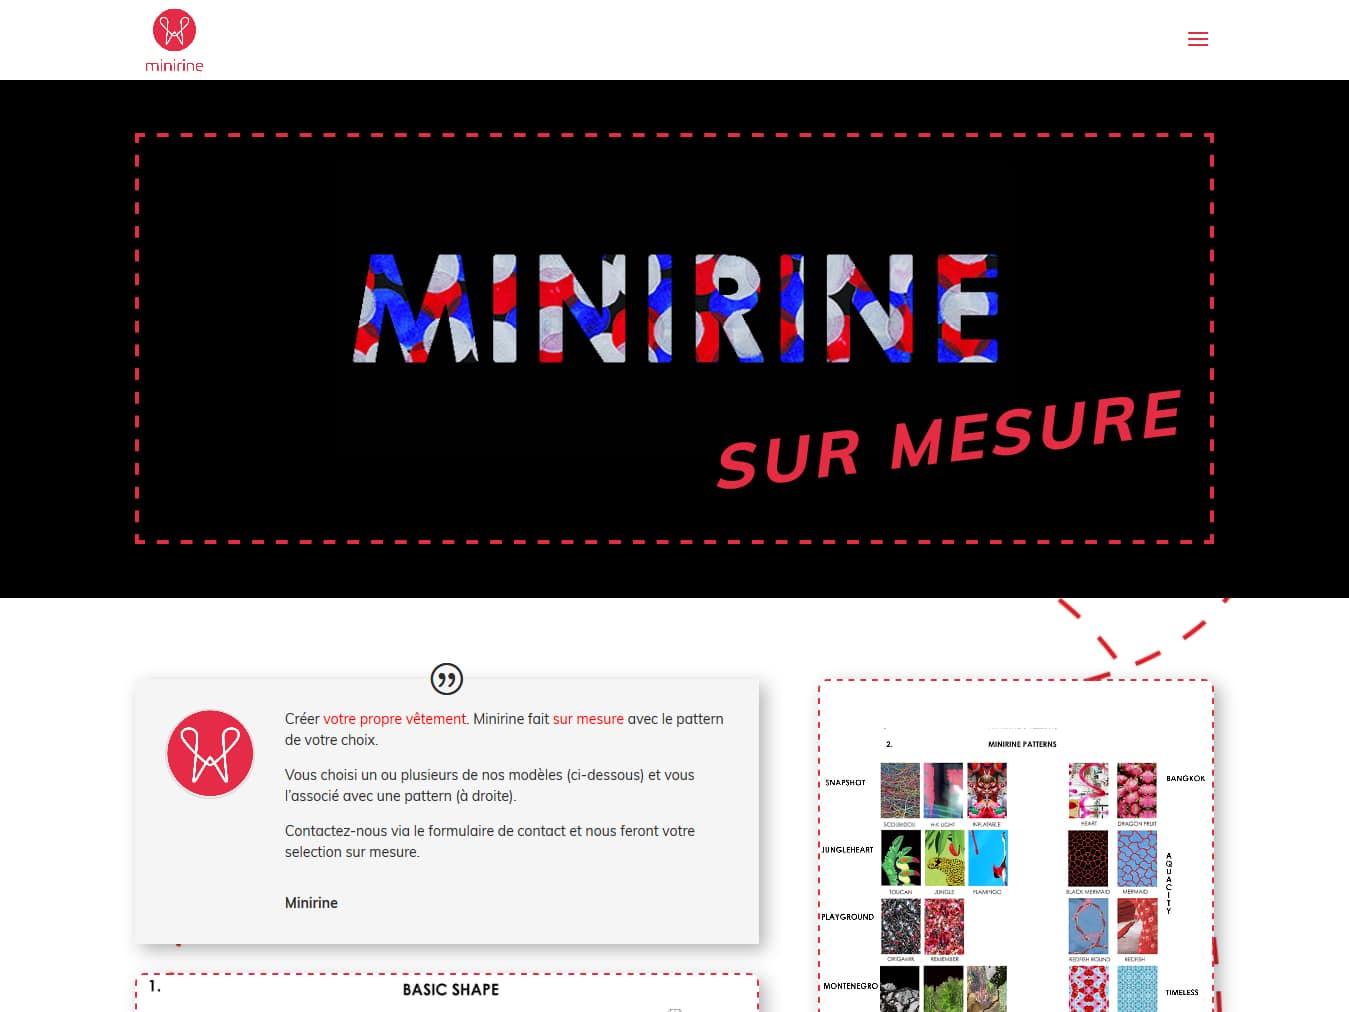 surmesure_rogné_minirine_julien